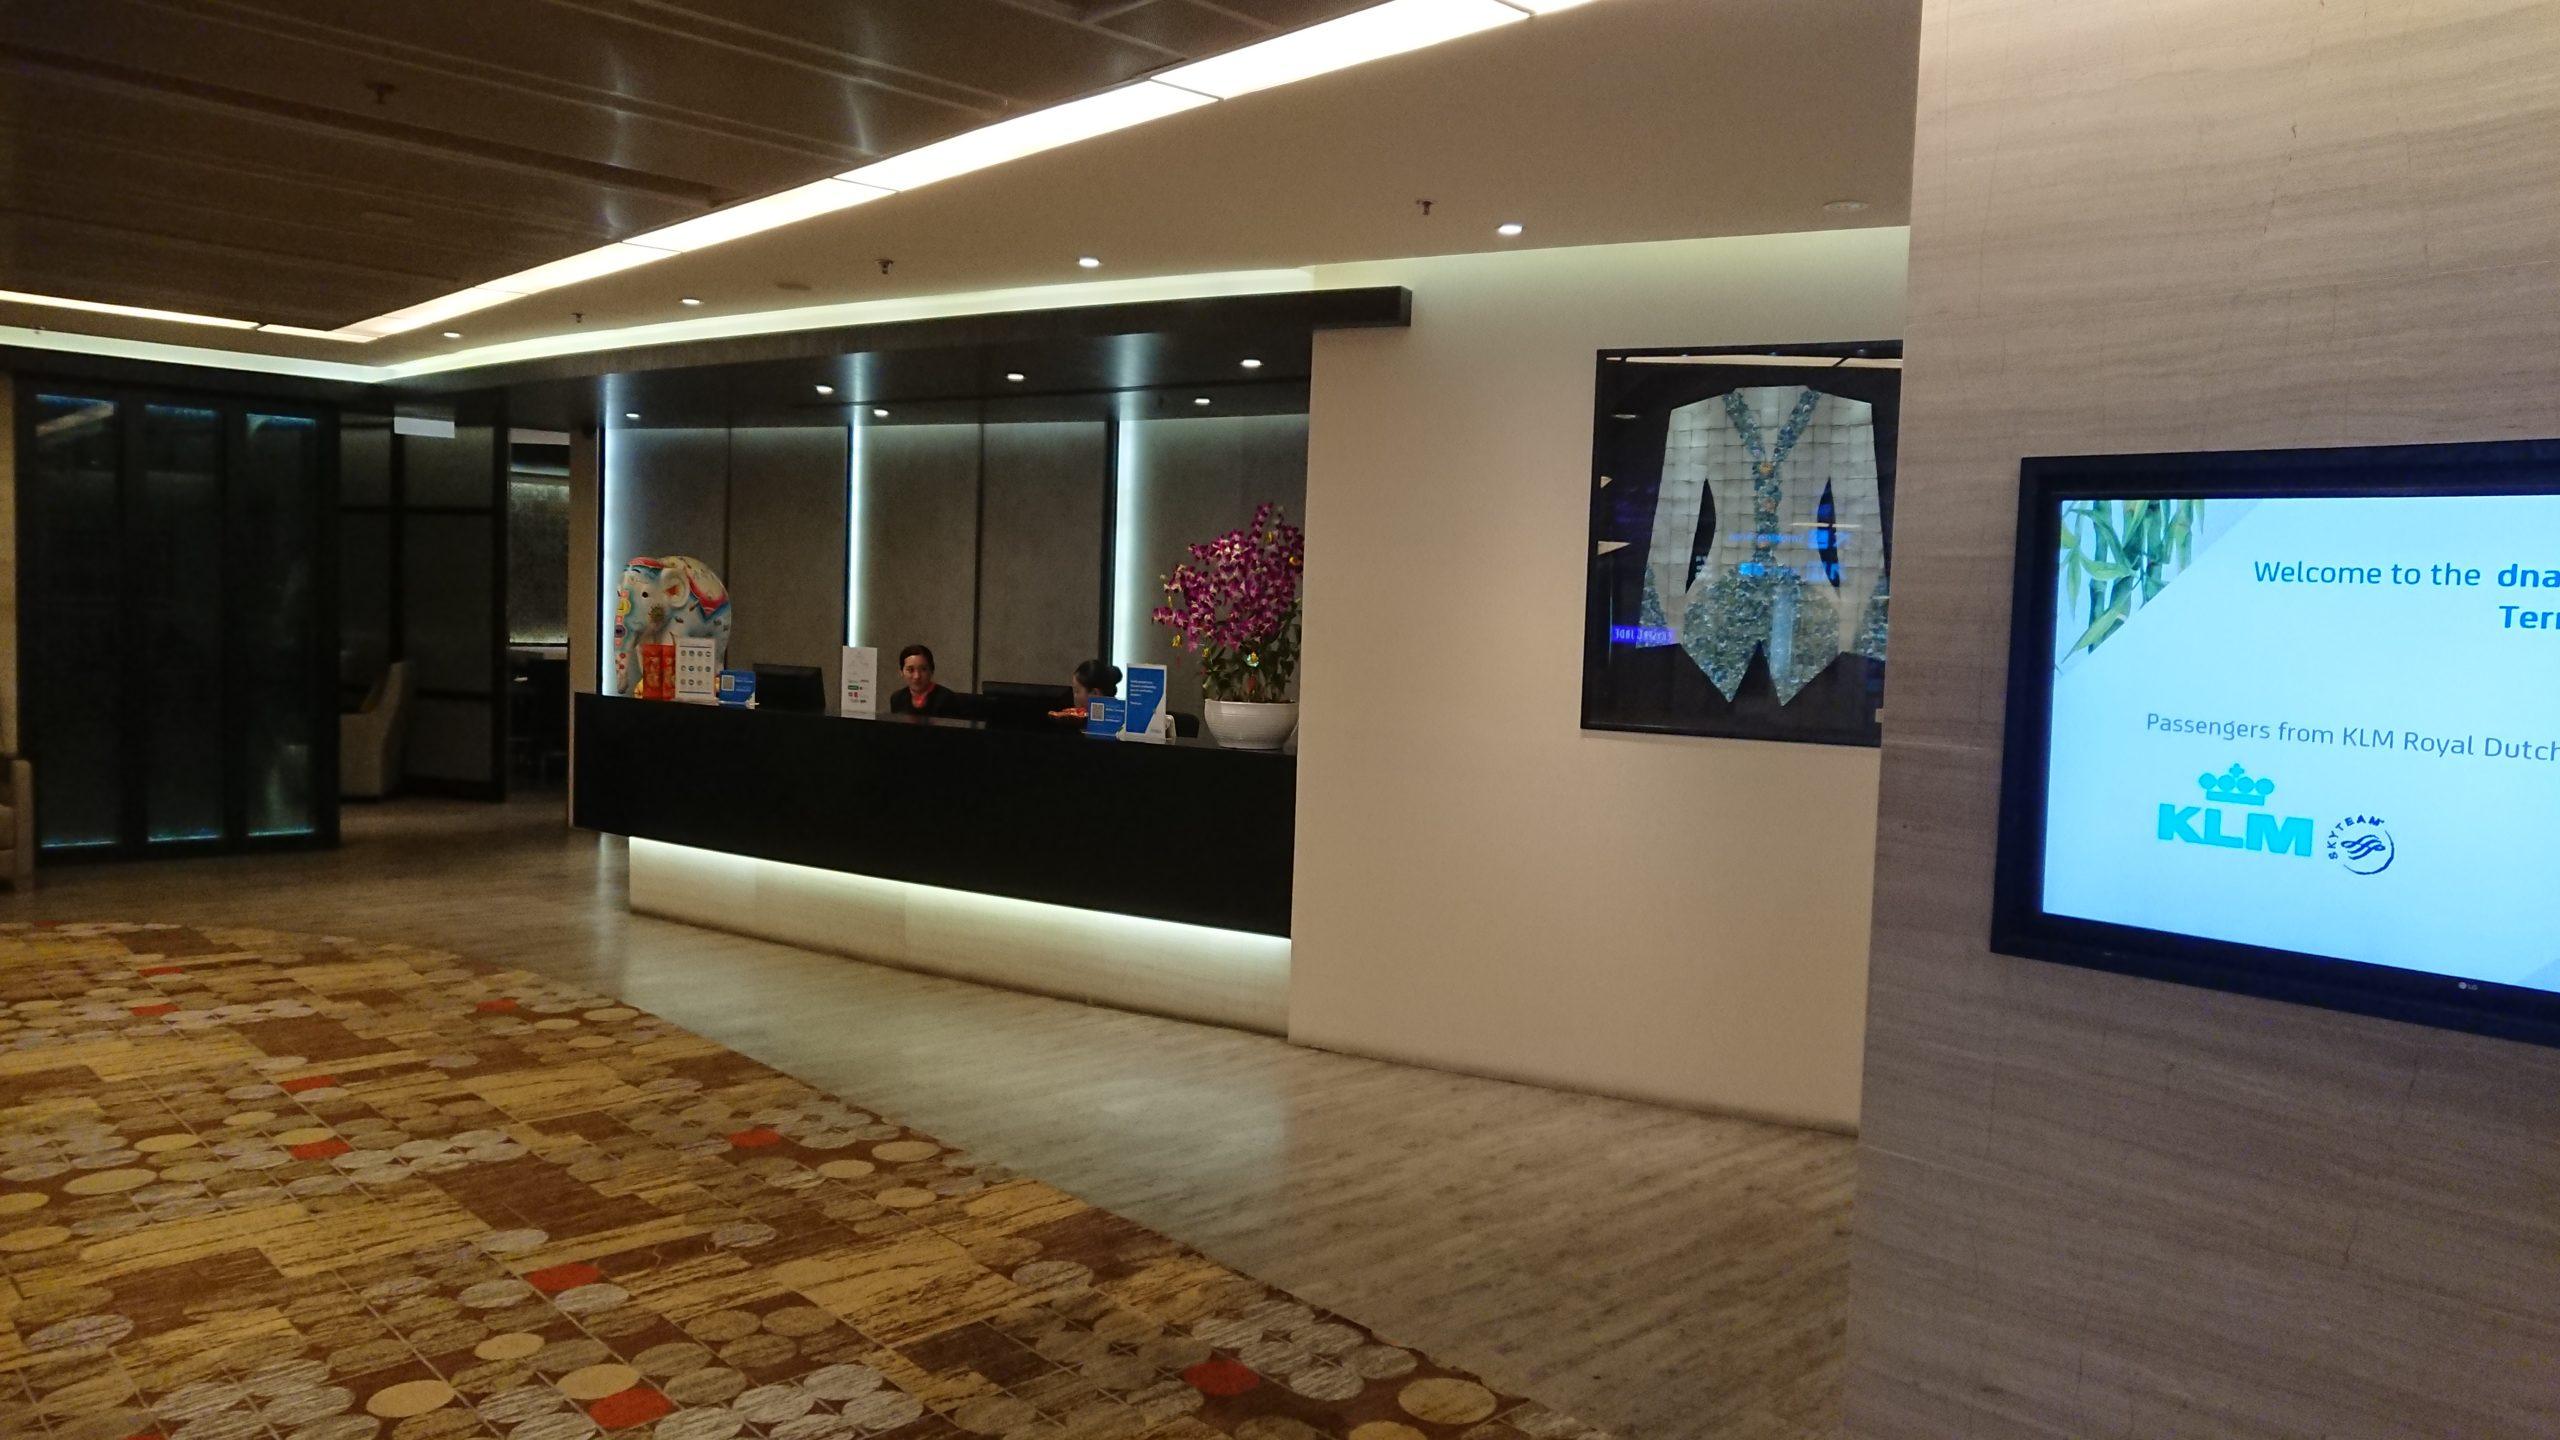 dnata Lounge (ターミナル1)